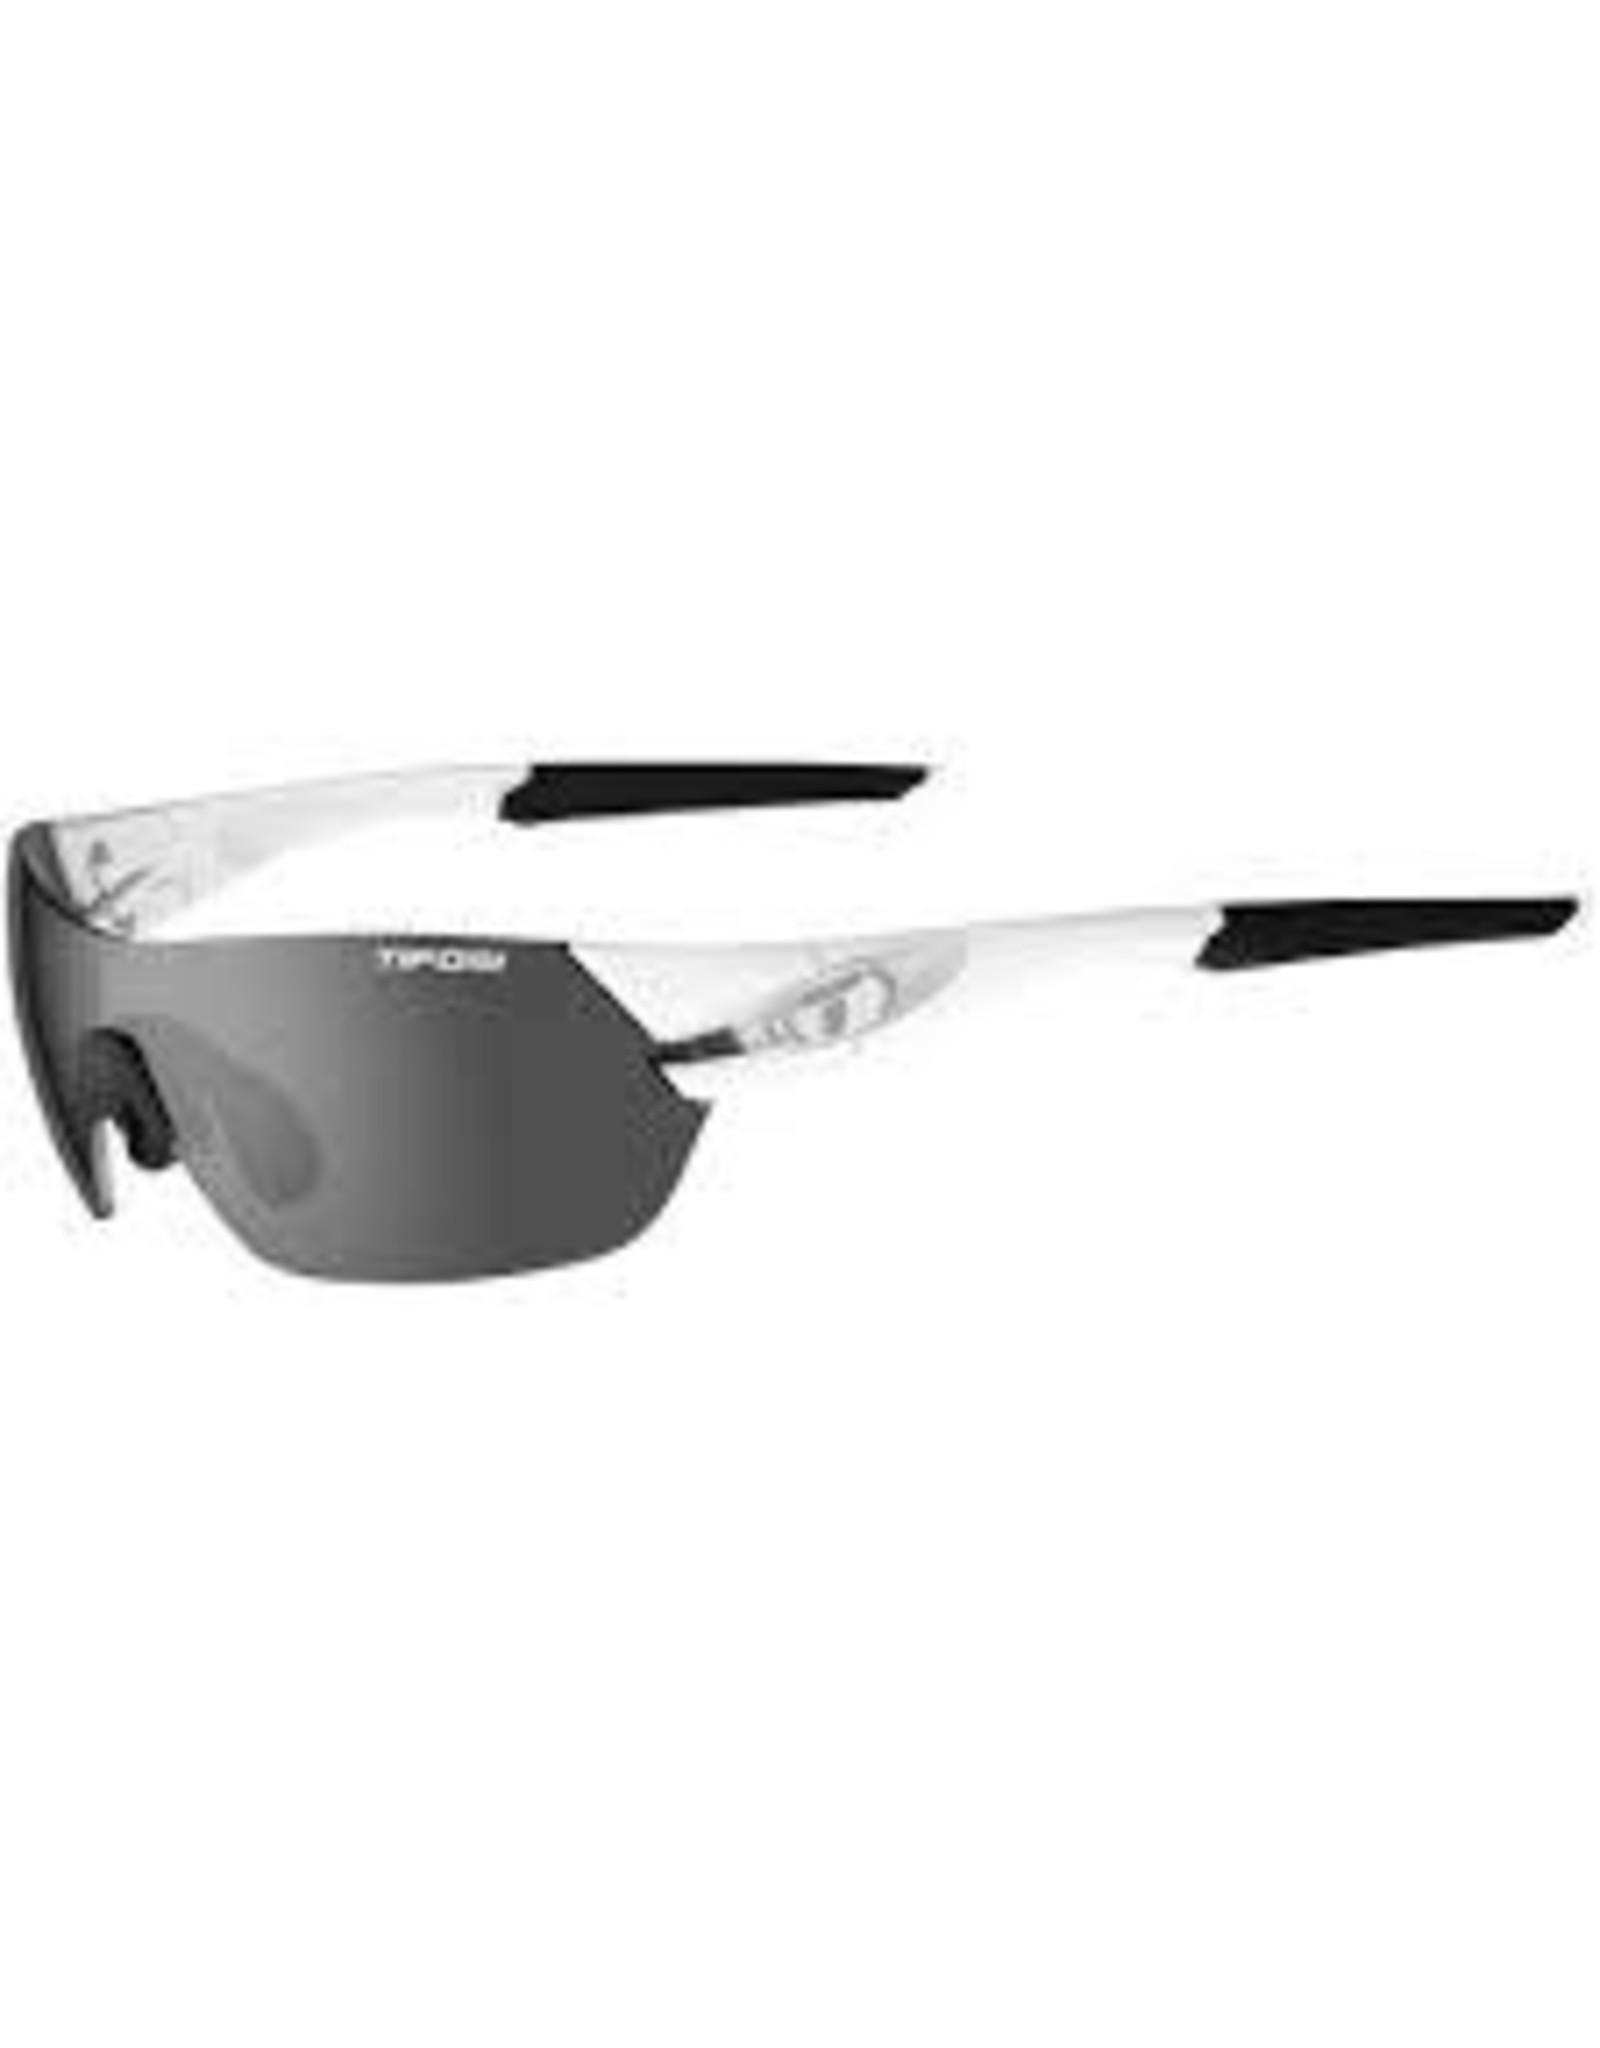 Tifosi Optics Sunglasses Tifosi Slice  Black/White Interchangeable